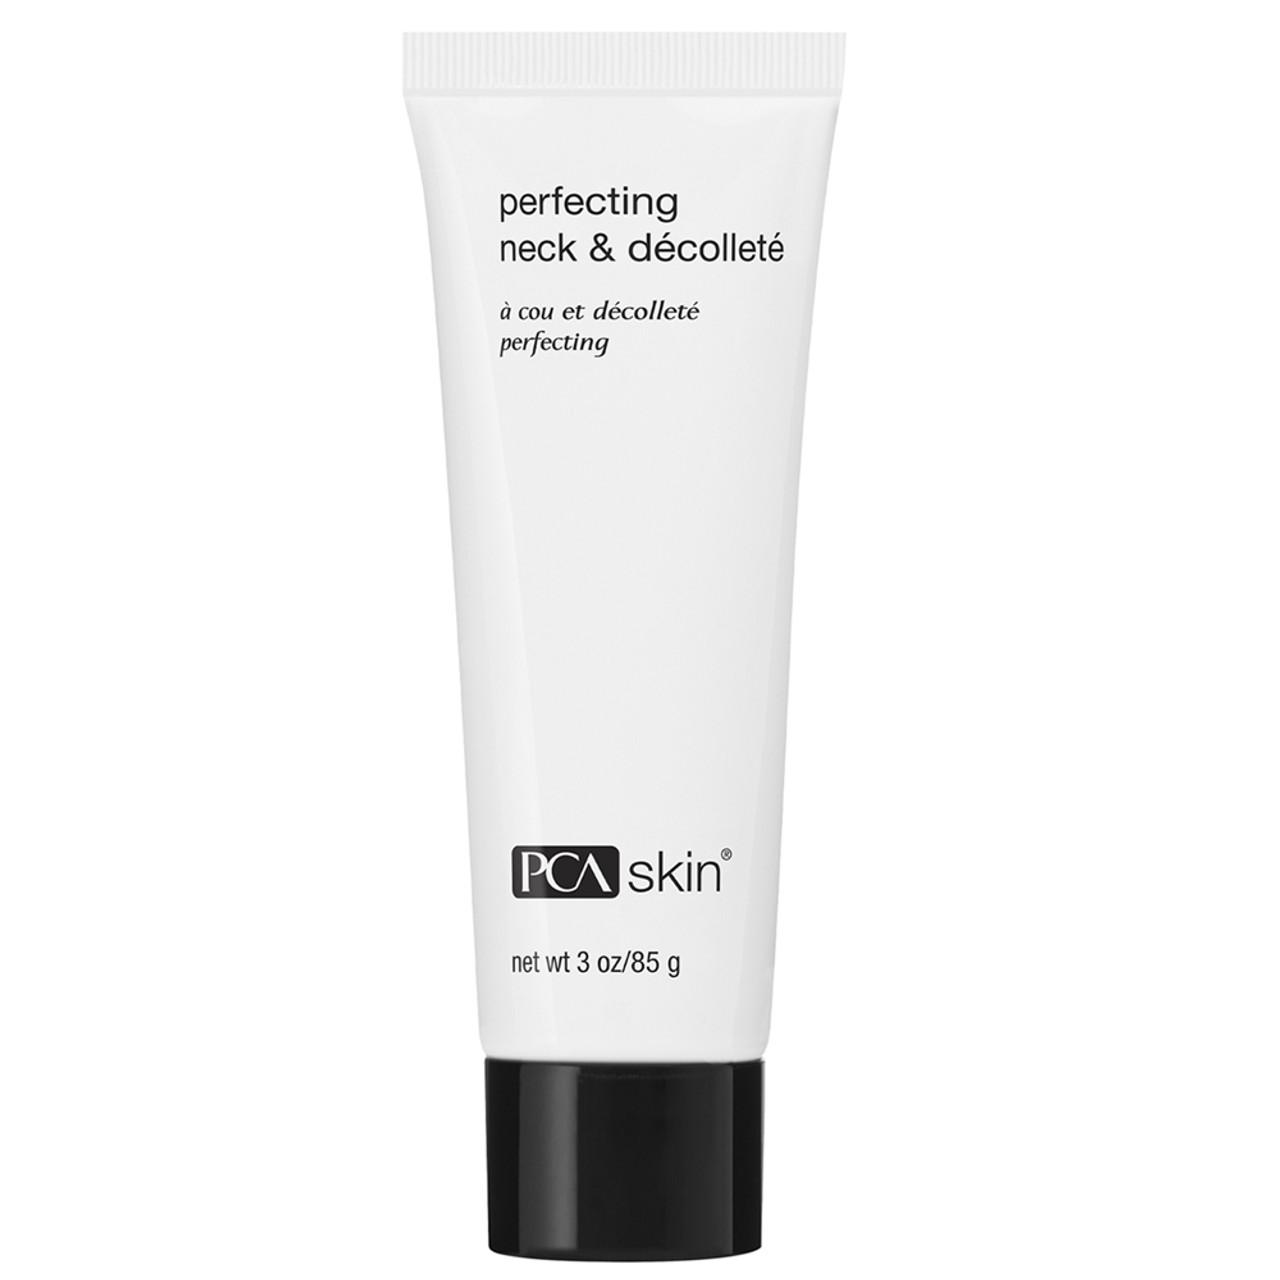 PCA Skin Perfecting Neck & Decollete BeautifiedYou.com